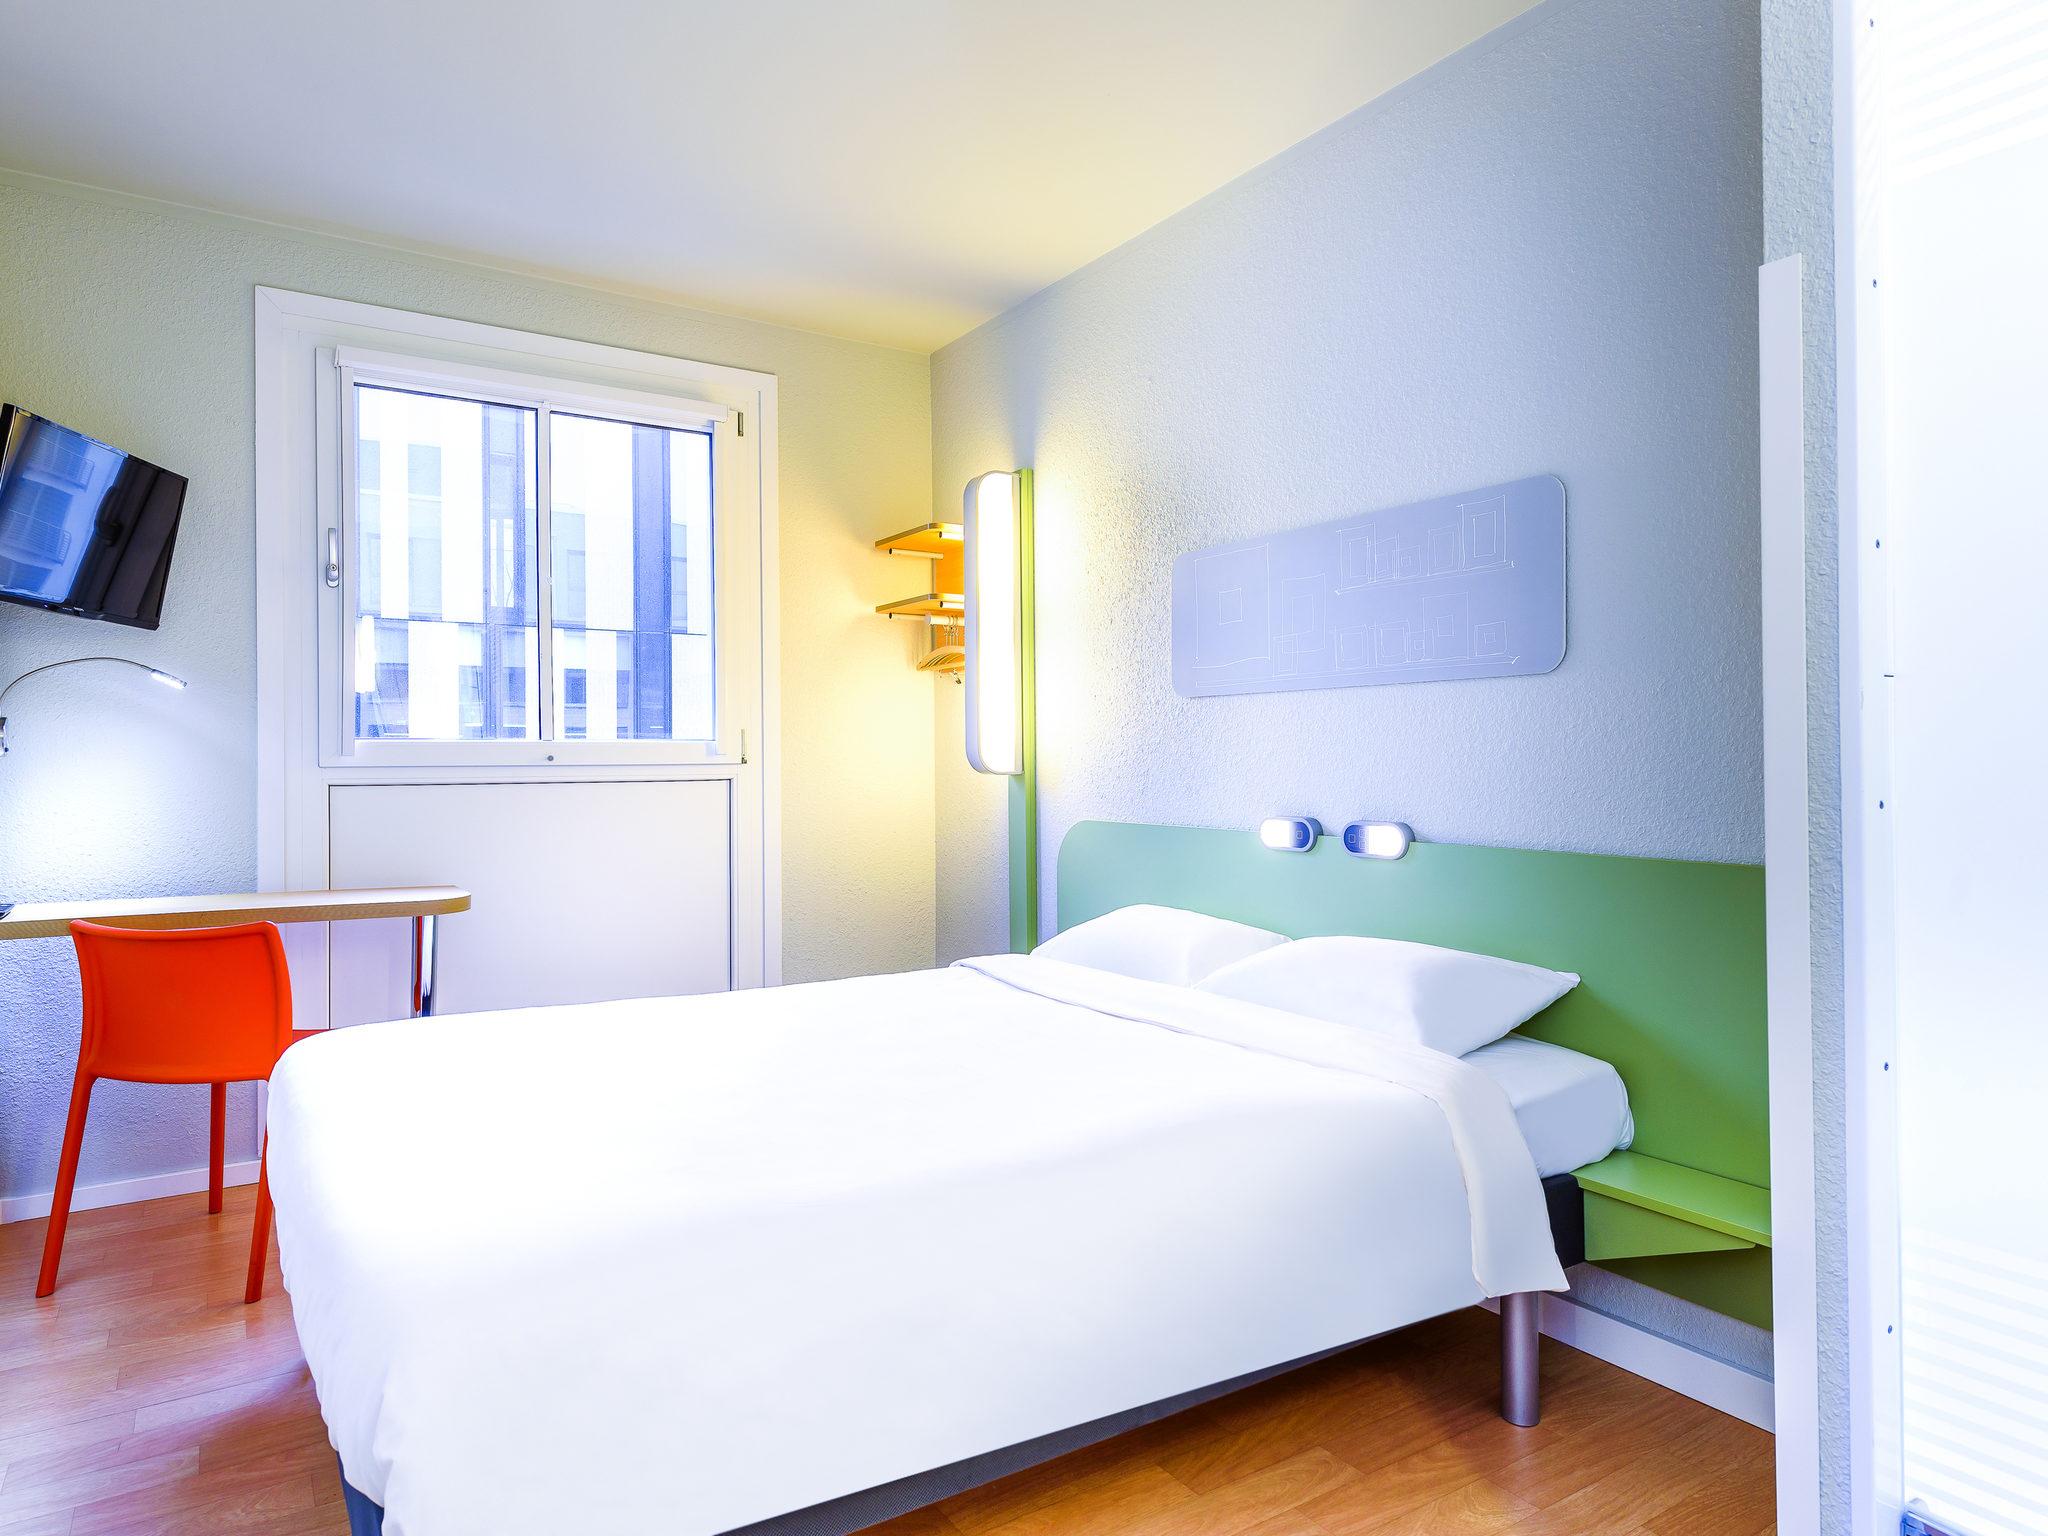 Hotel Ibis Leibpzig